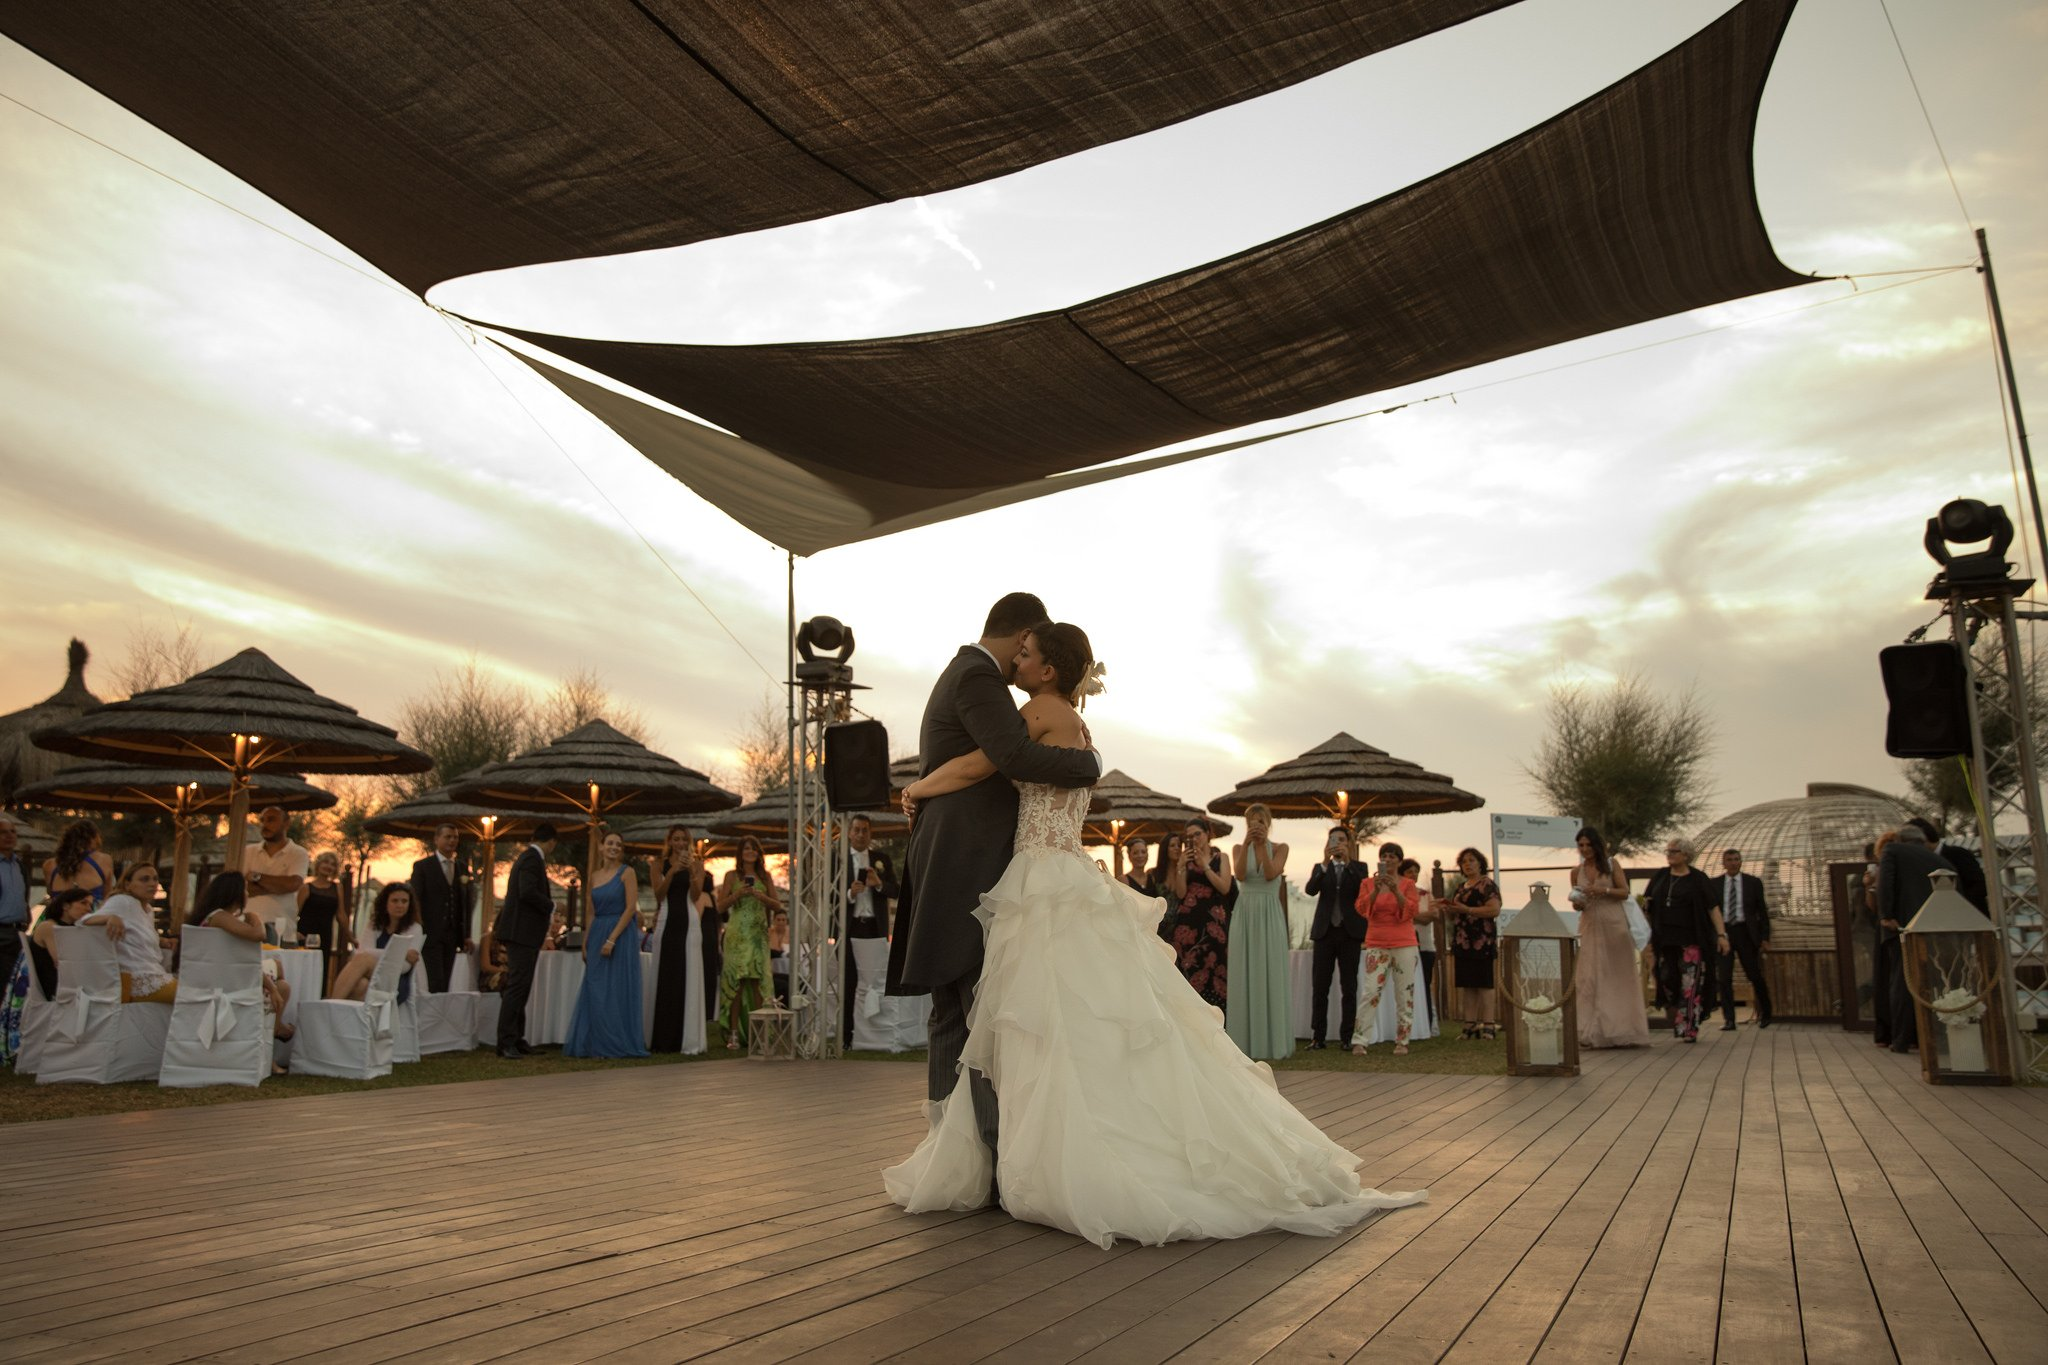 Matrimonio al Mare al Naut in Club